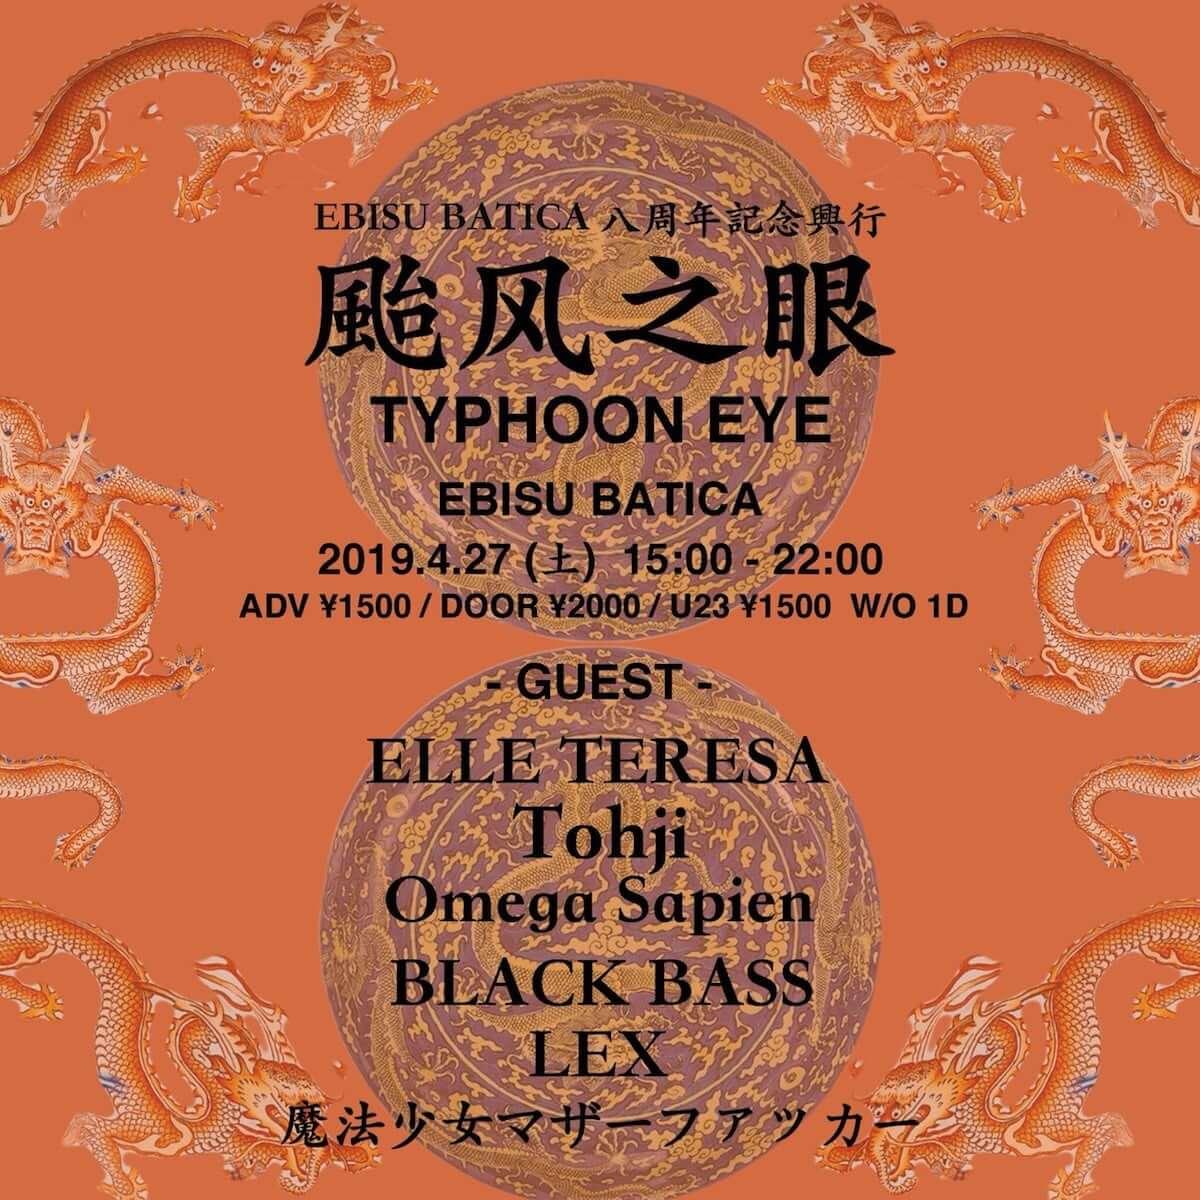 ELLE TERESAやTohji、Omega Sapienが登場 「Typhoon Eye」が恵比寿BATICAの8周年記念興行にて開催 music190417-ebisu-batica-8th-anniversary-typhoon-ryr-1-1200x1200